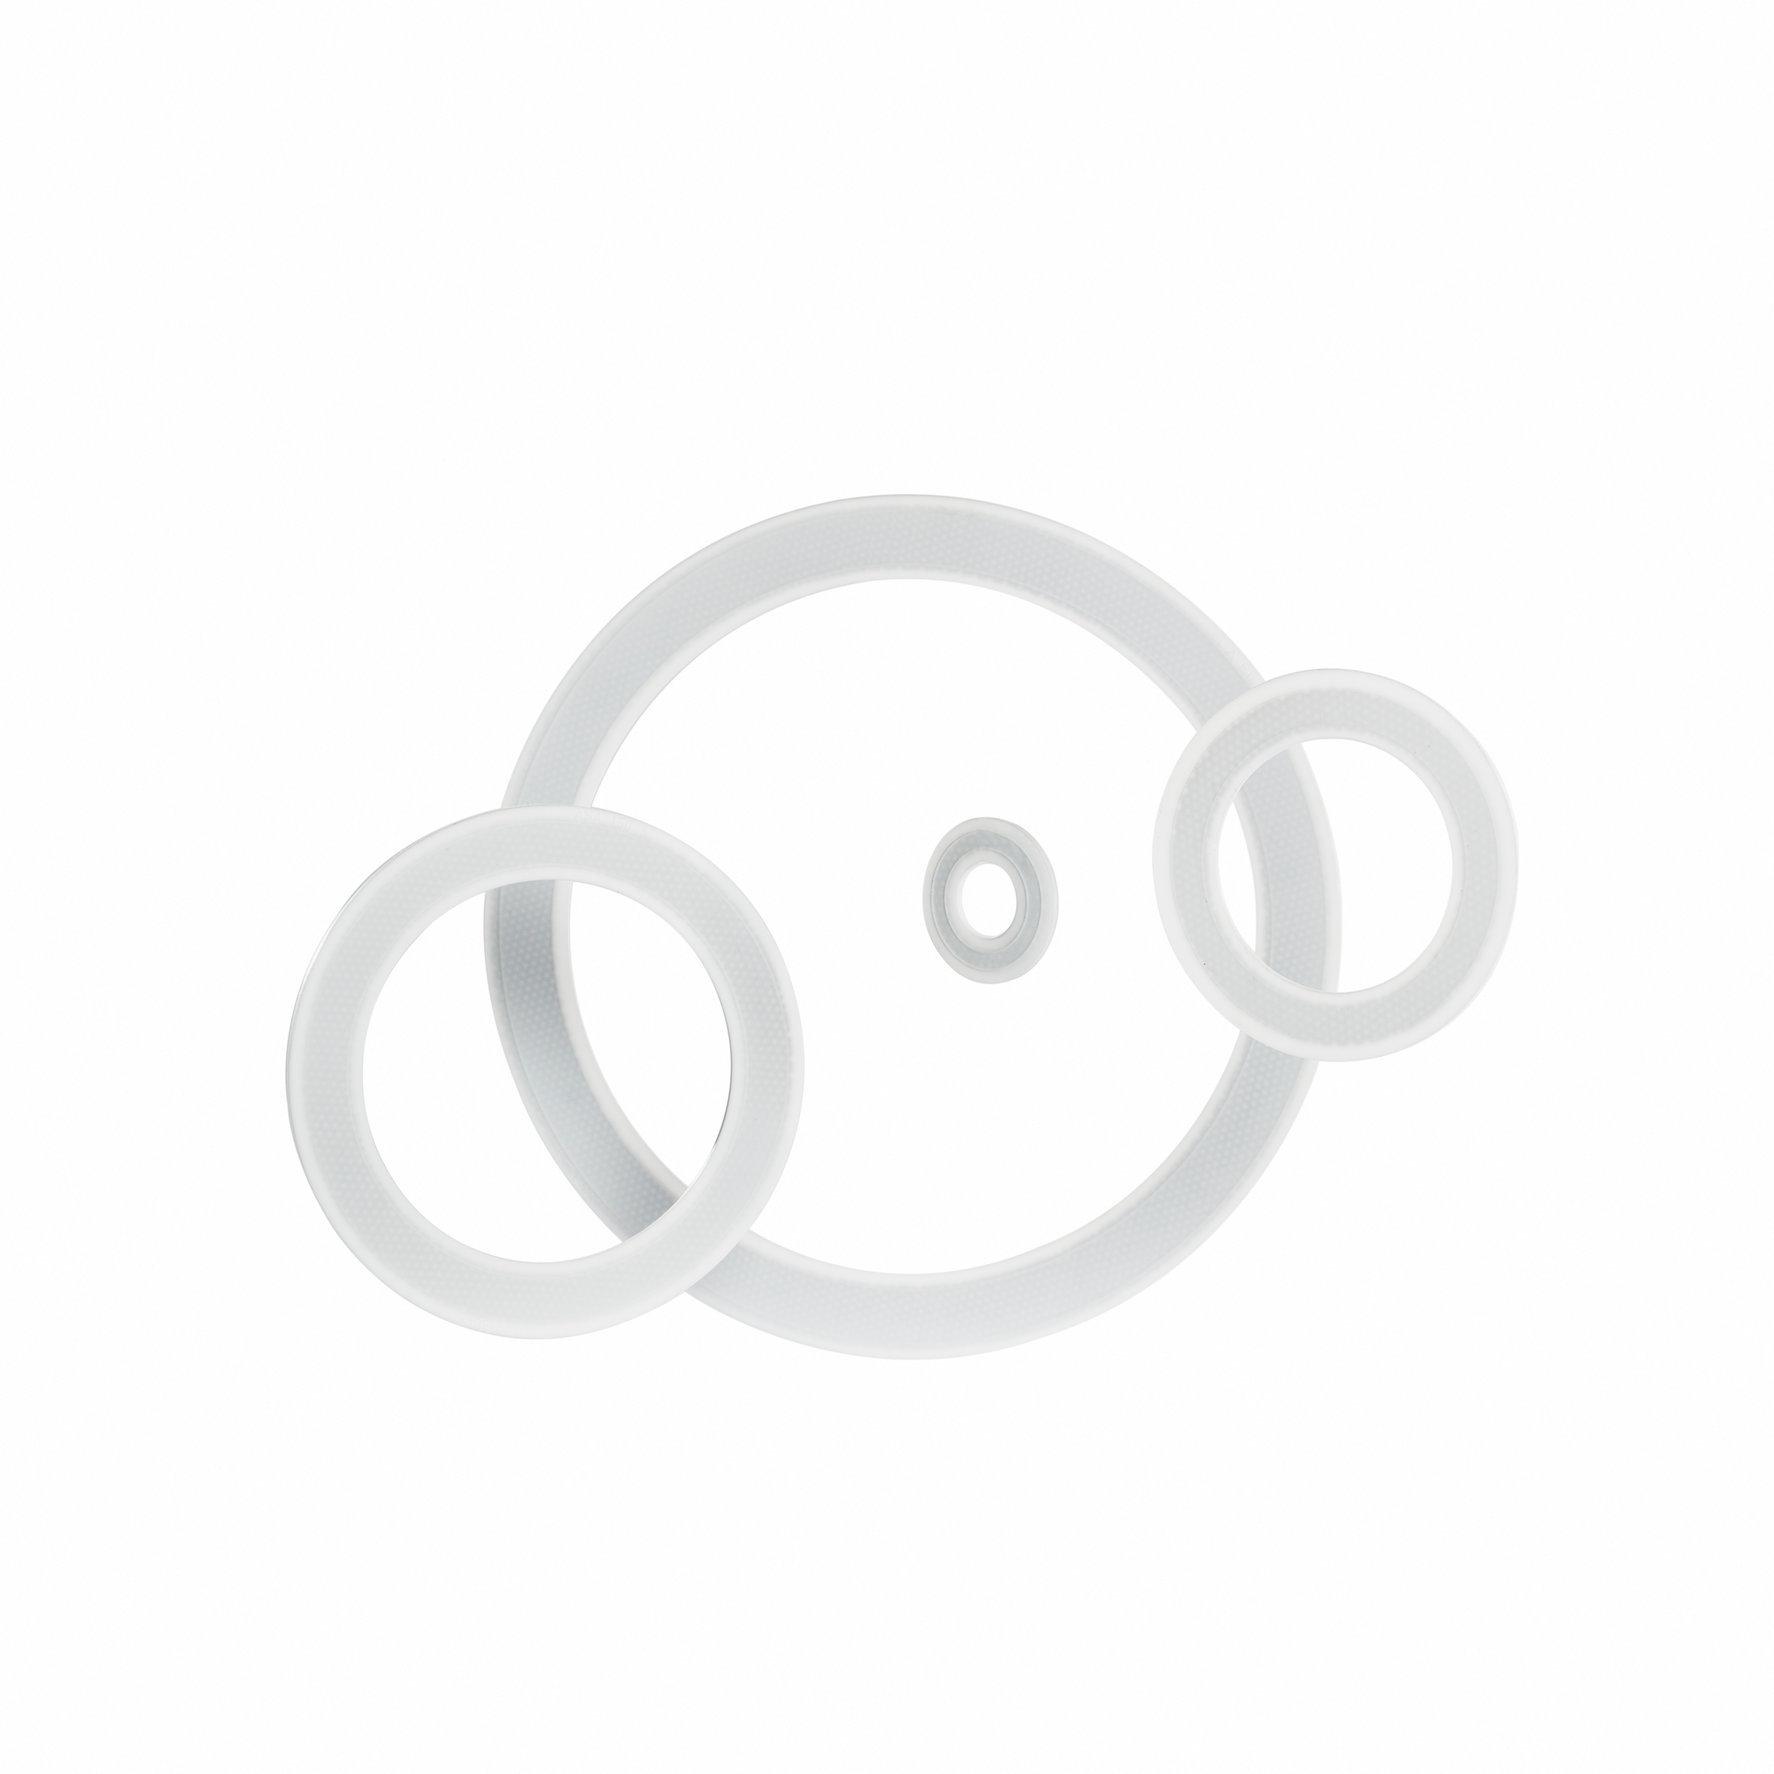 20180822 114043  PDS_Z4A1323-edited.jpg